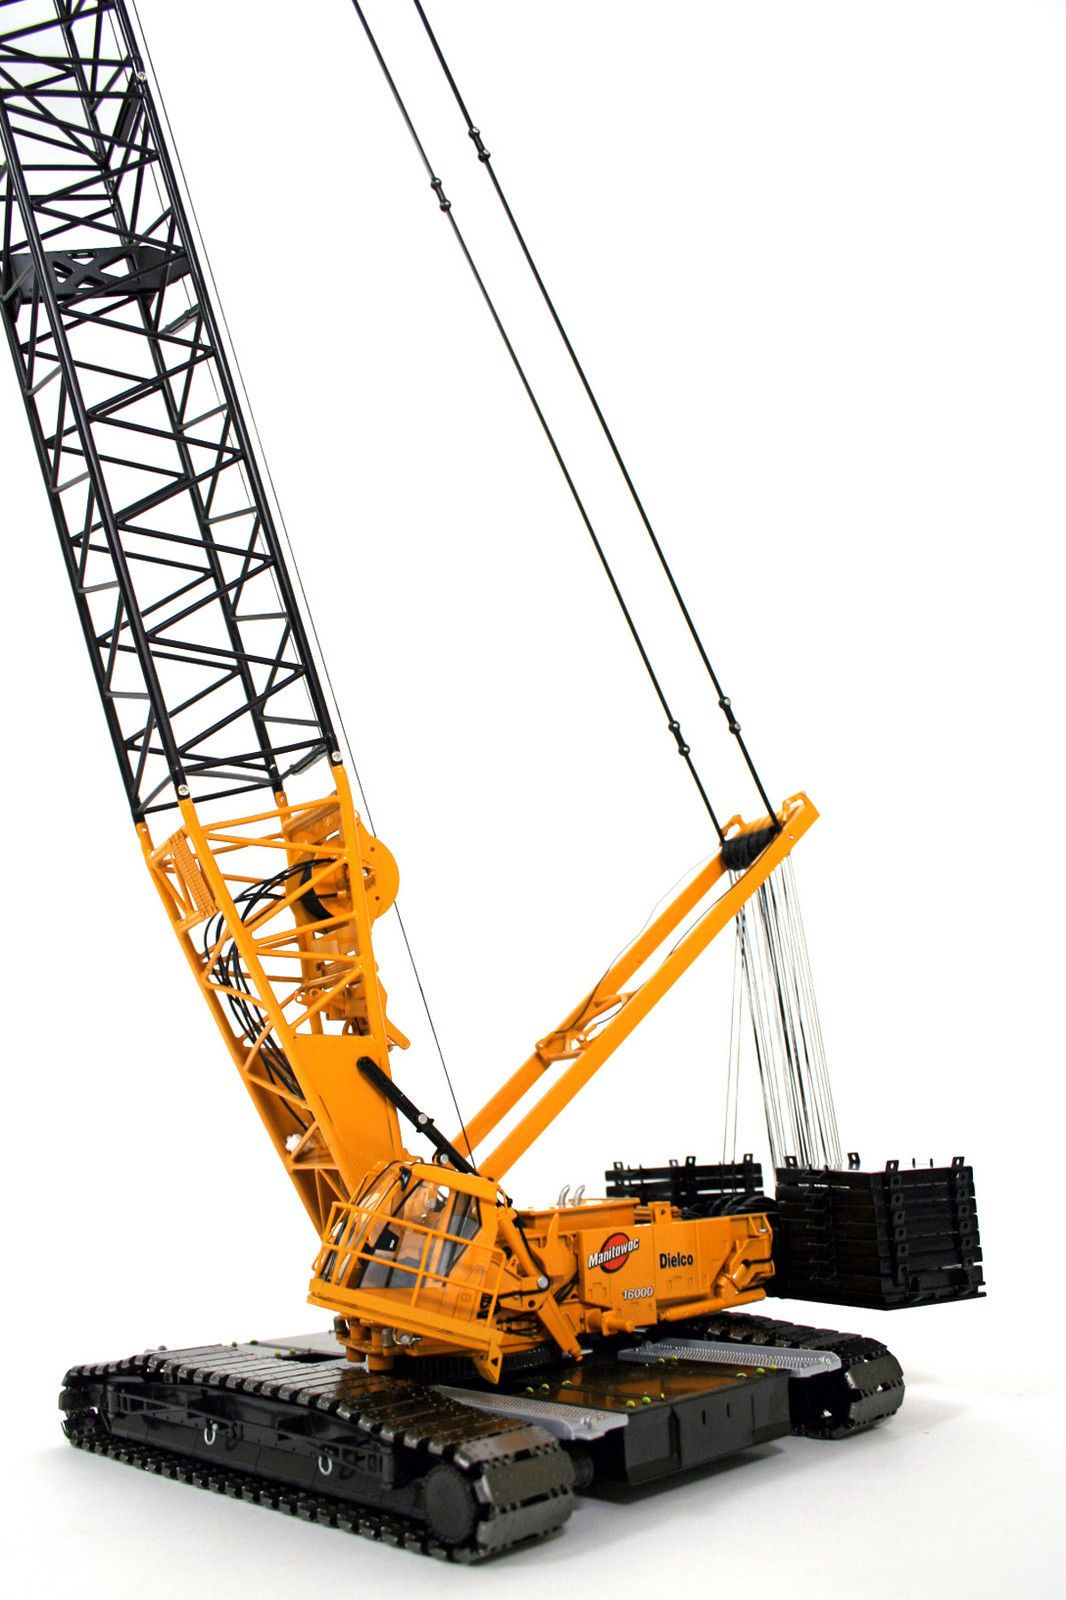 Manitowoc 16000 Crawler Crane Dielco 1 50 Twh 016 01028 Crawler Crane Crane Lego Crane